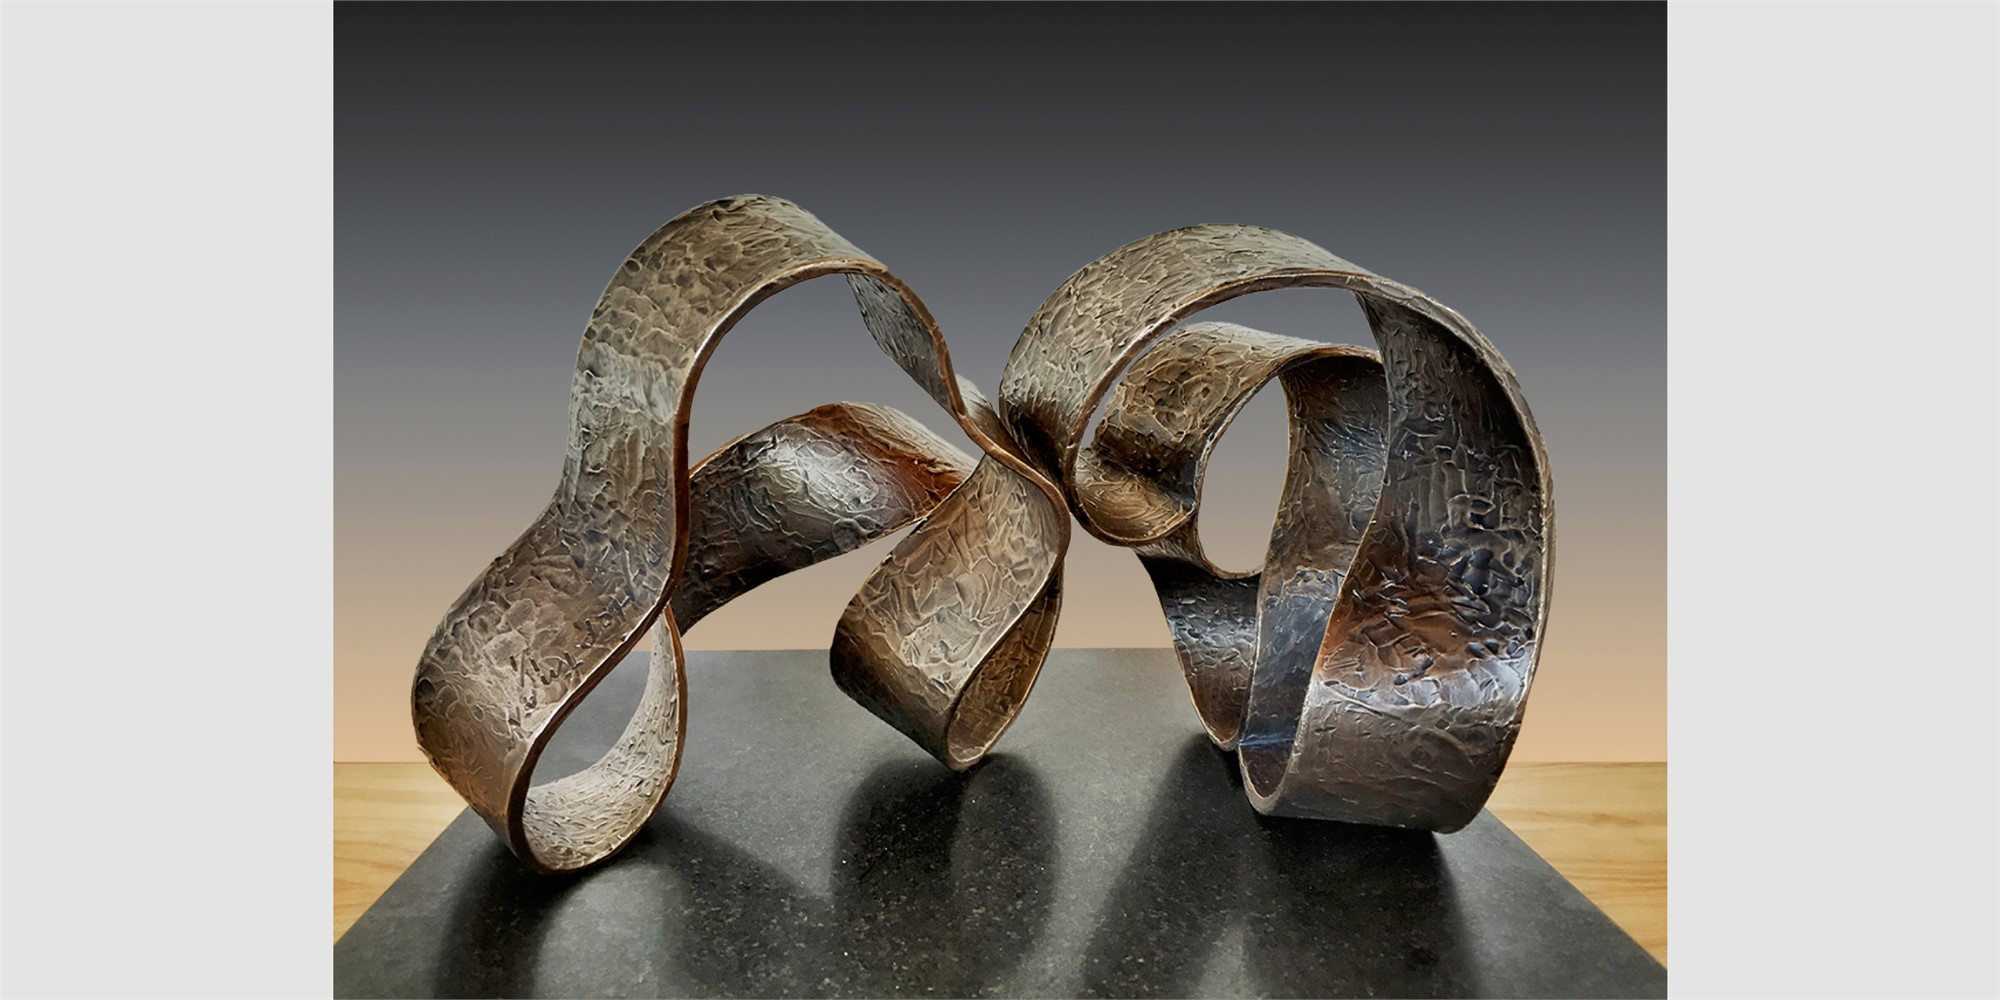 Wave Form by David Hoptman